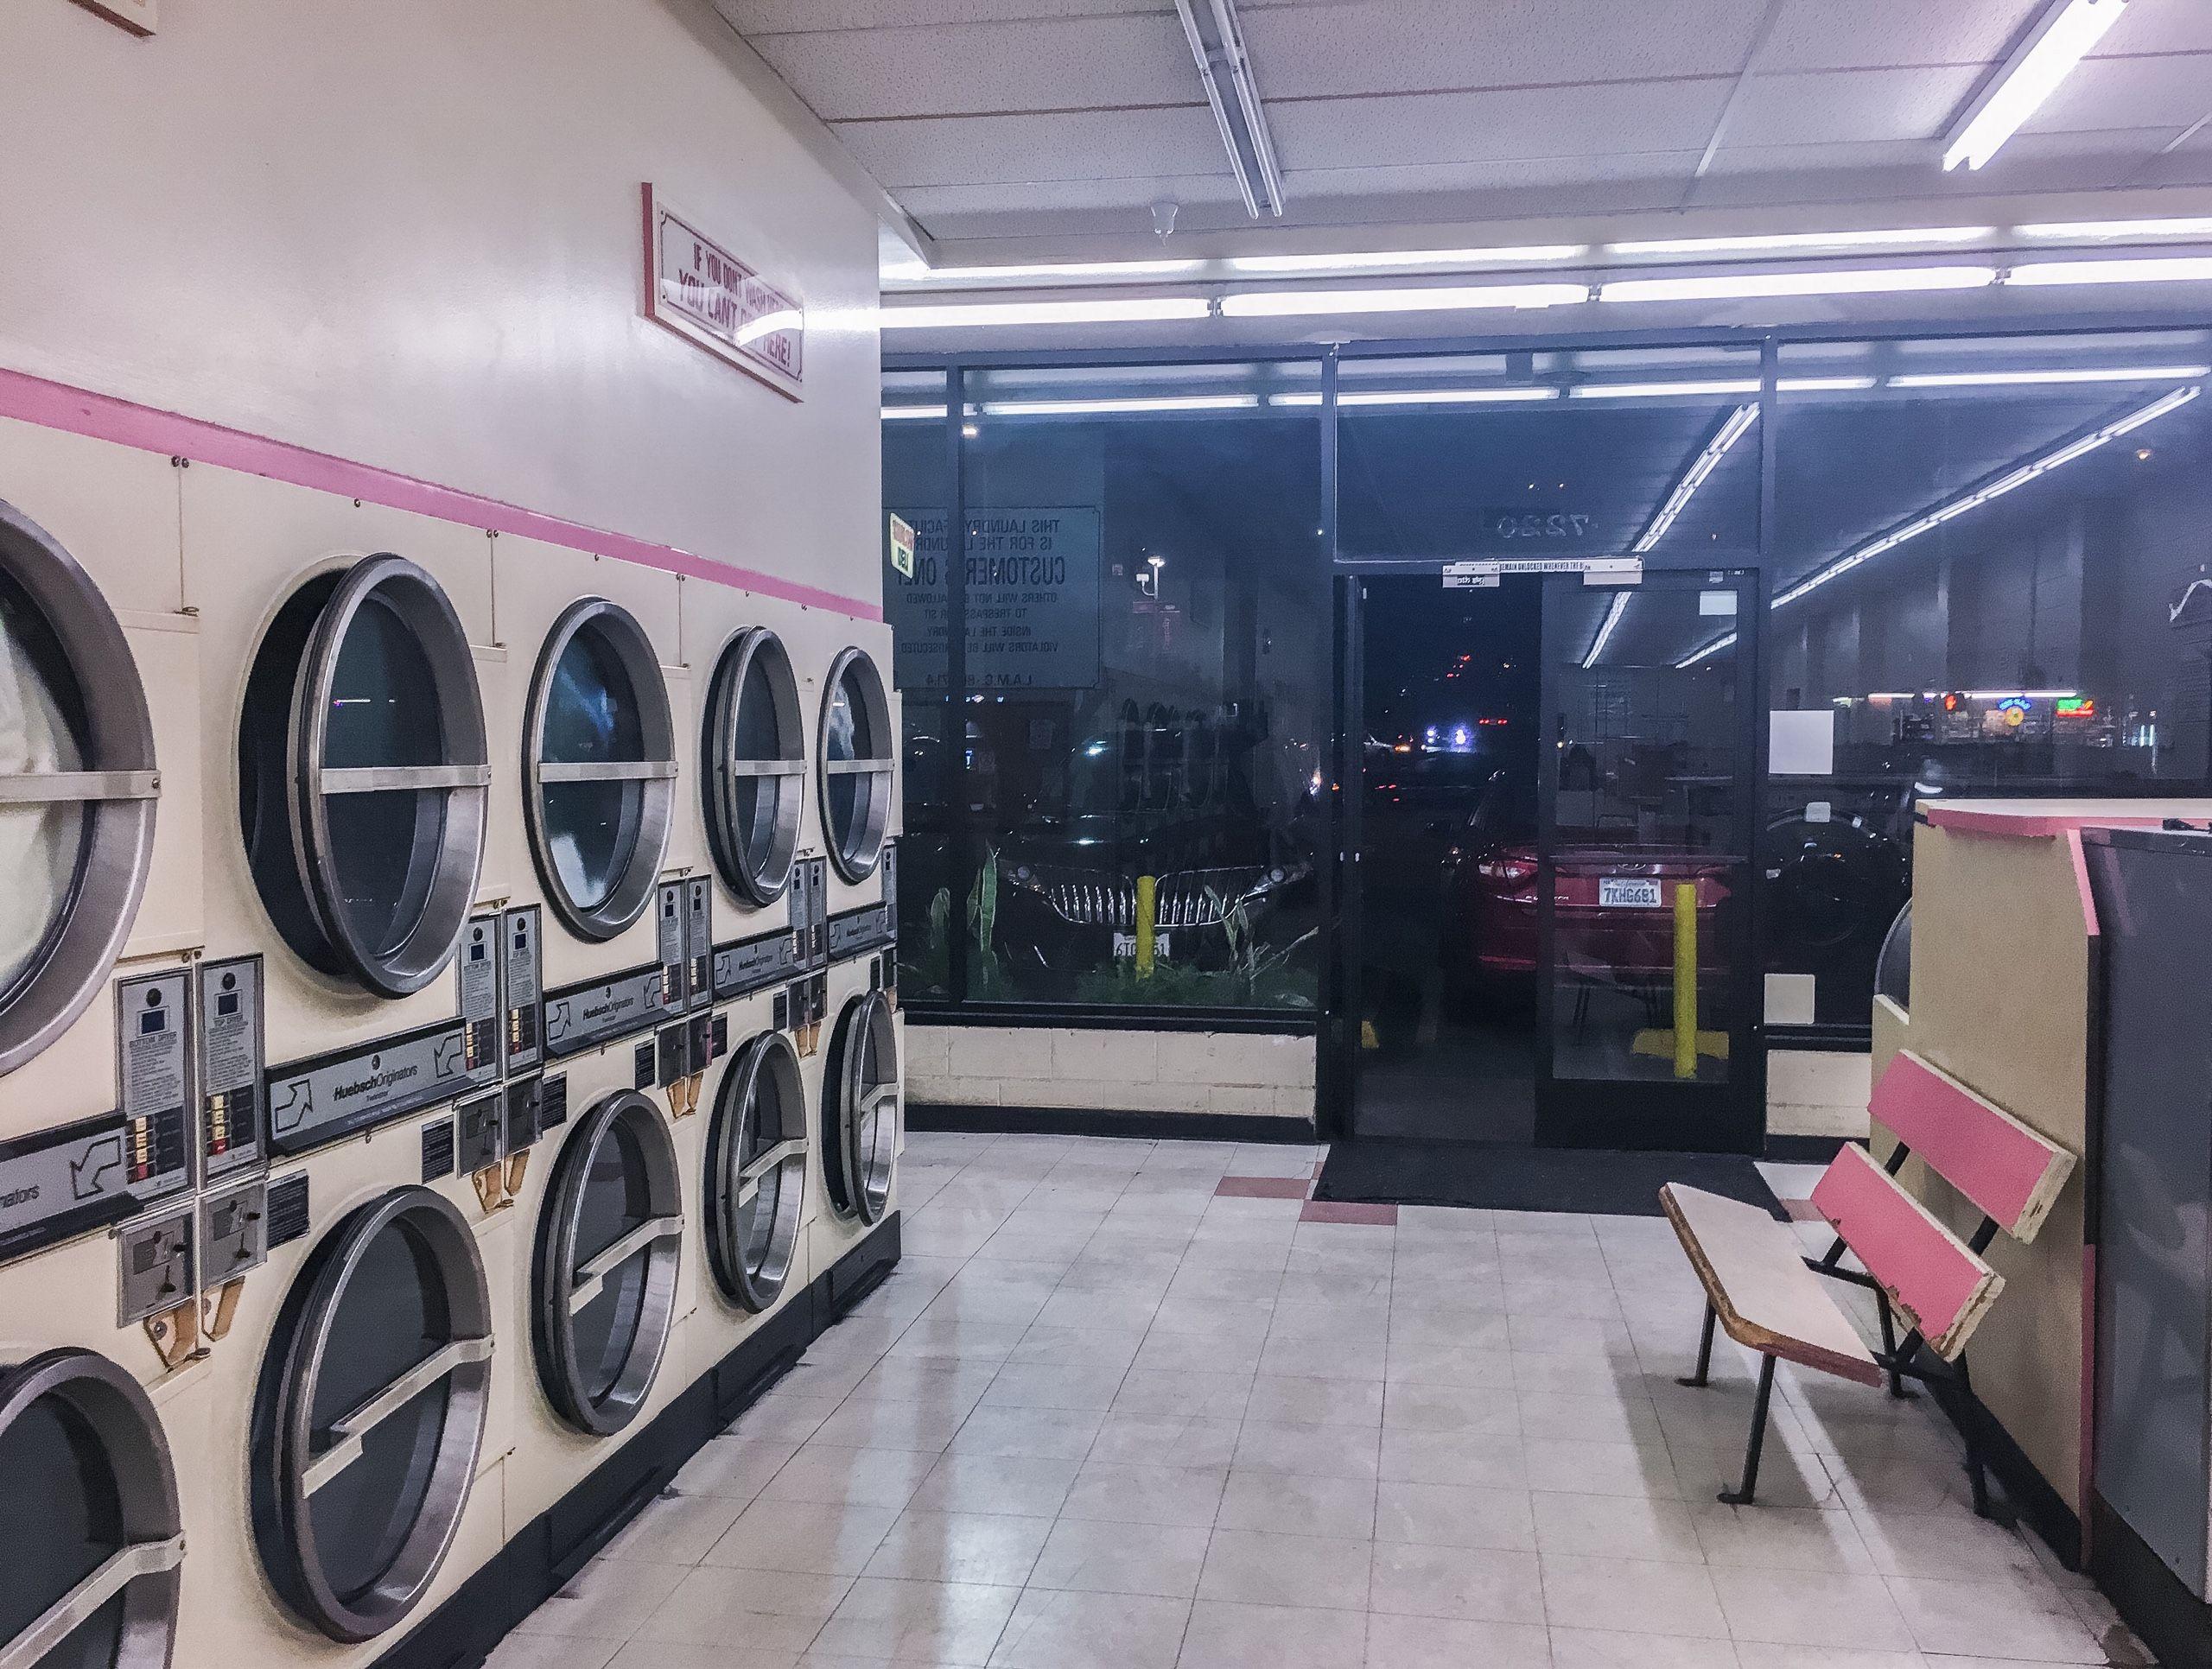 Laundromat In Hollywood Signe Pierce Artist Photographer